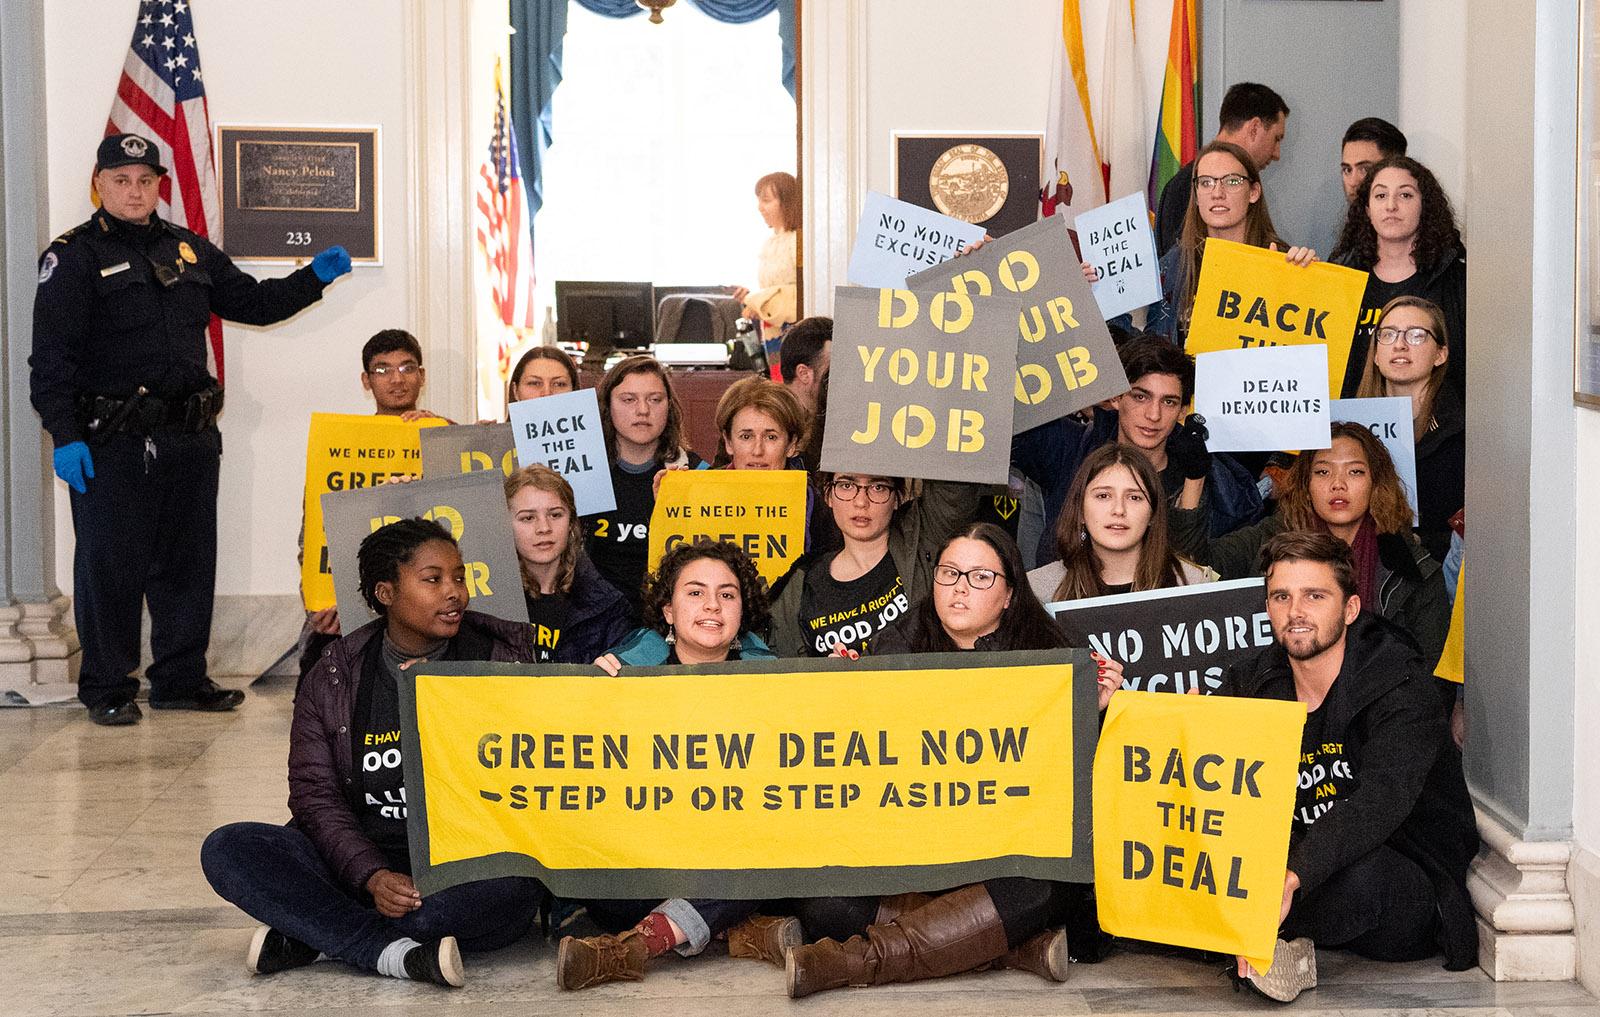 Sunrise Movement protesters inside the office of Democratic House Speaker Nancy Pelosi, Capitol, Washington, D.C., December 10, 2018